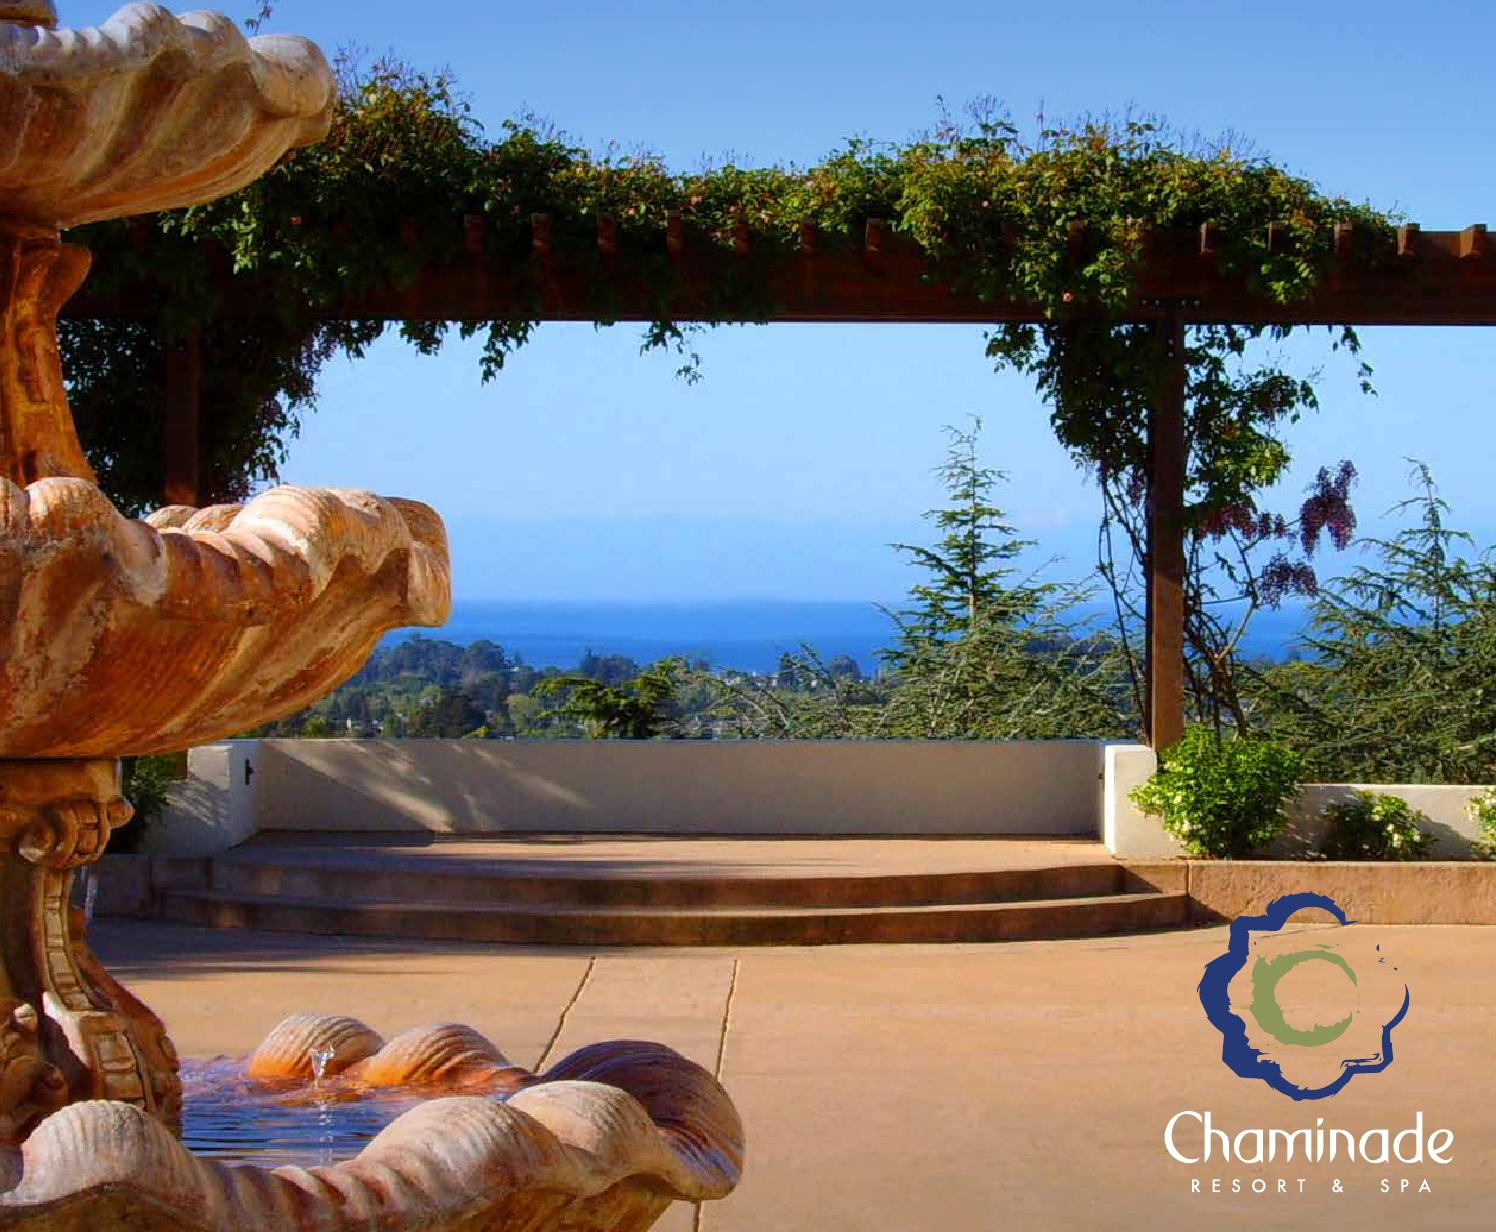 Chaminade Resort Spa Logo